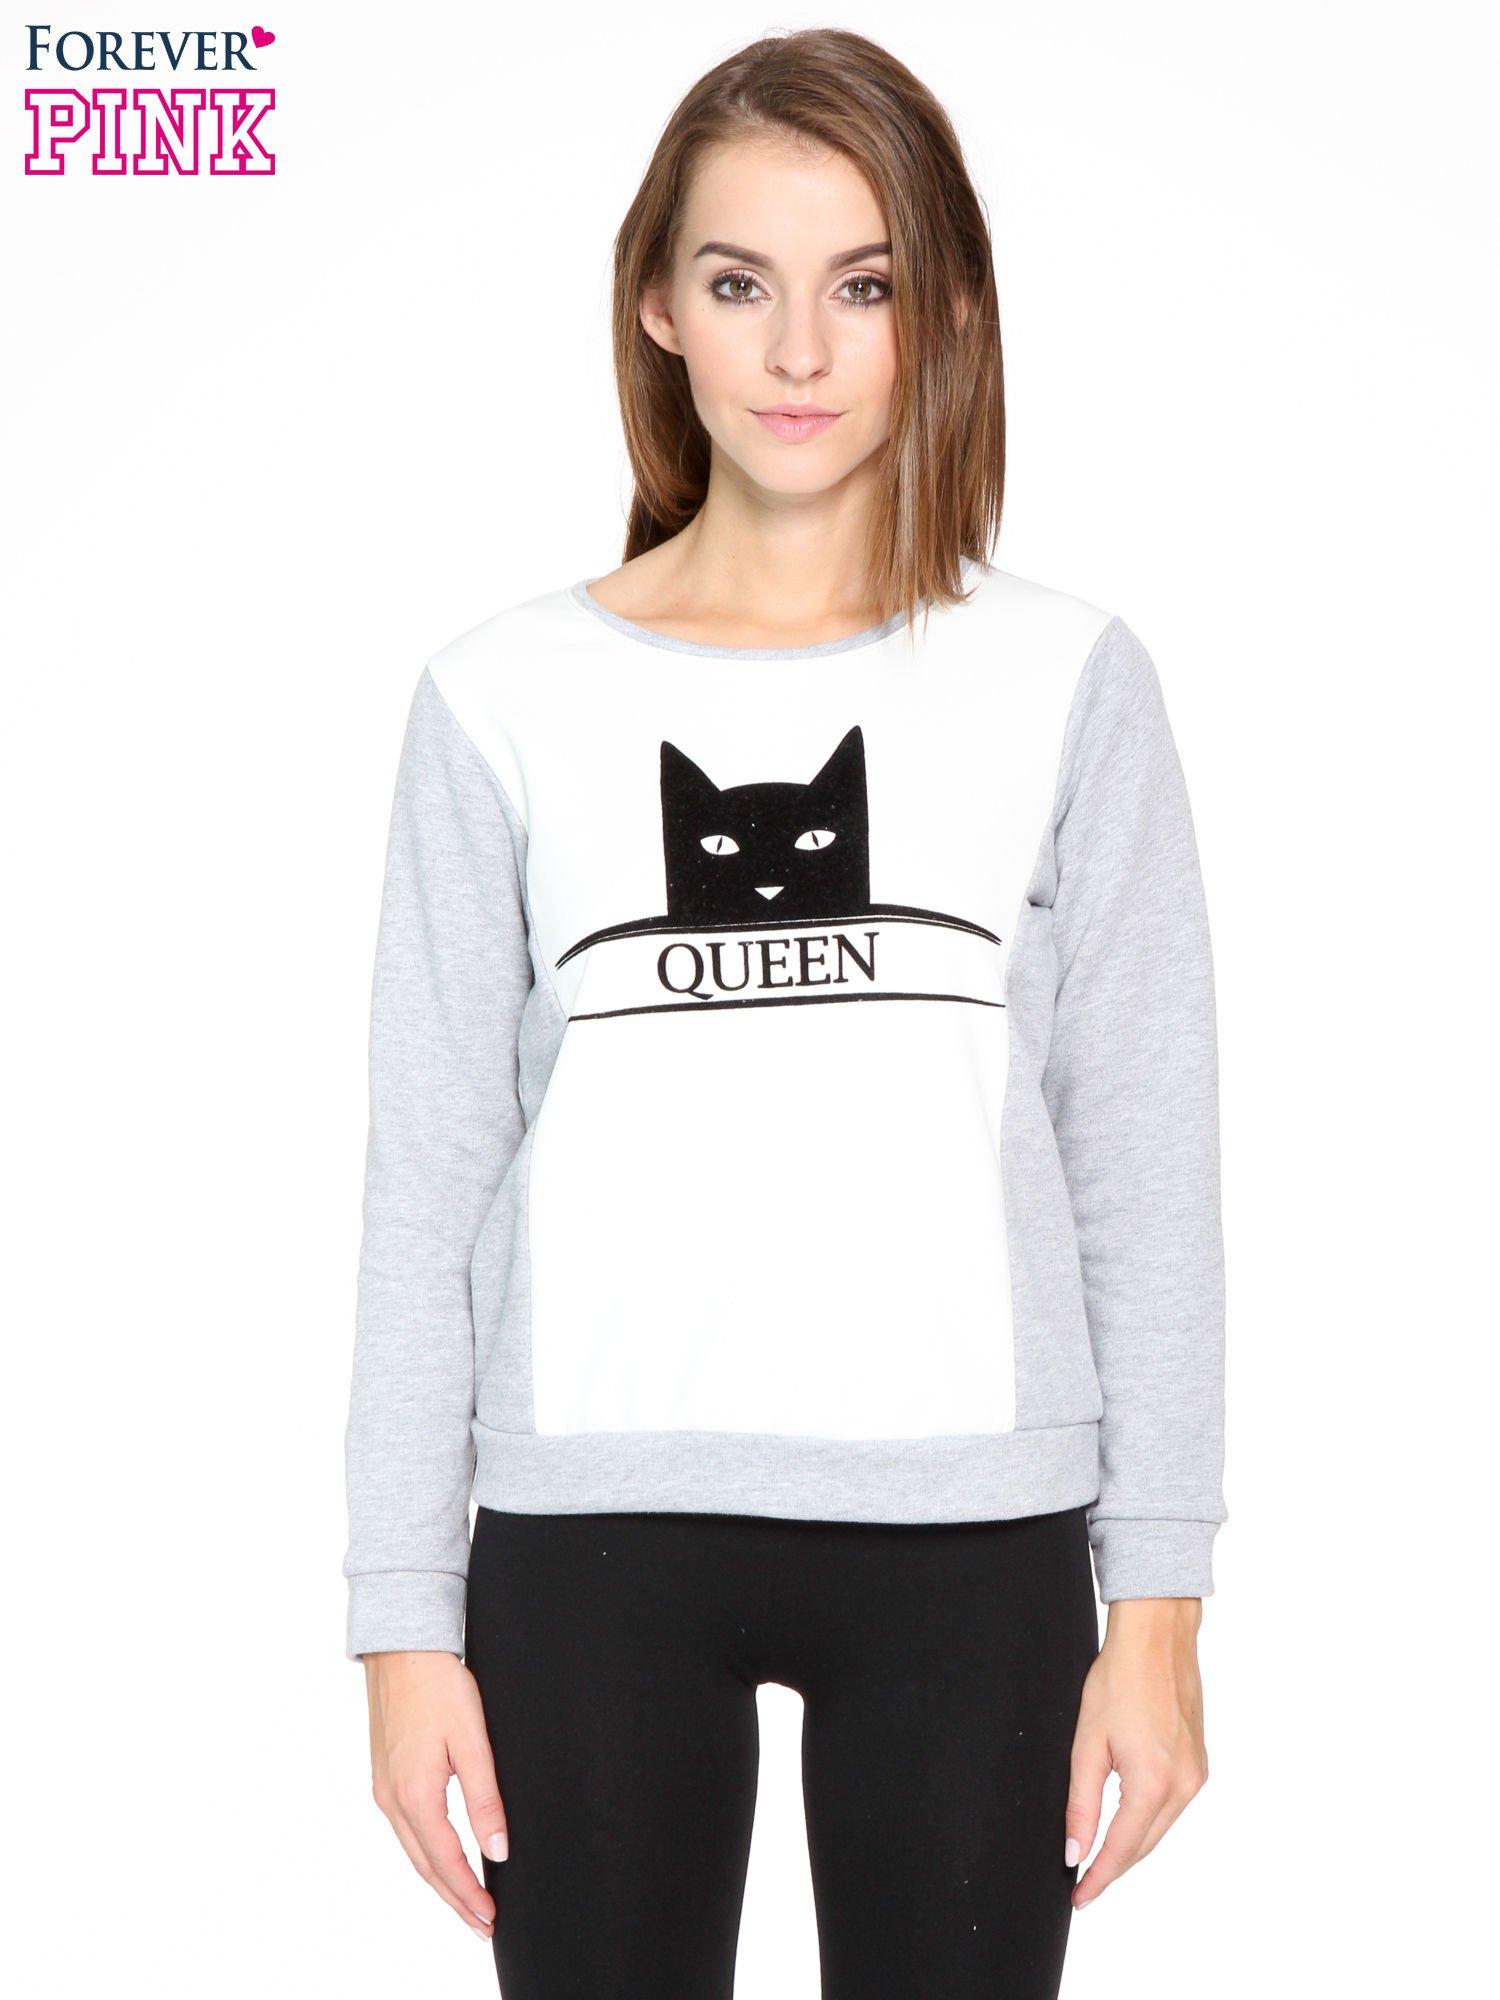 Szara dresowa bluza z nadrukiem kota i napisem QUEEN                                  zdj.                                  1